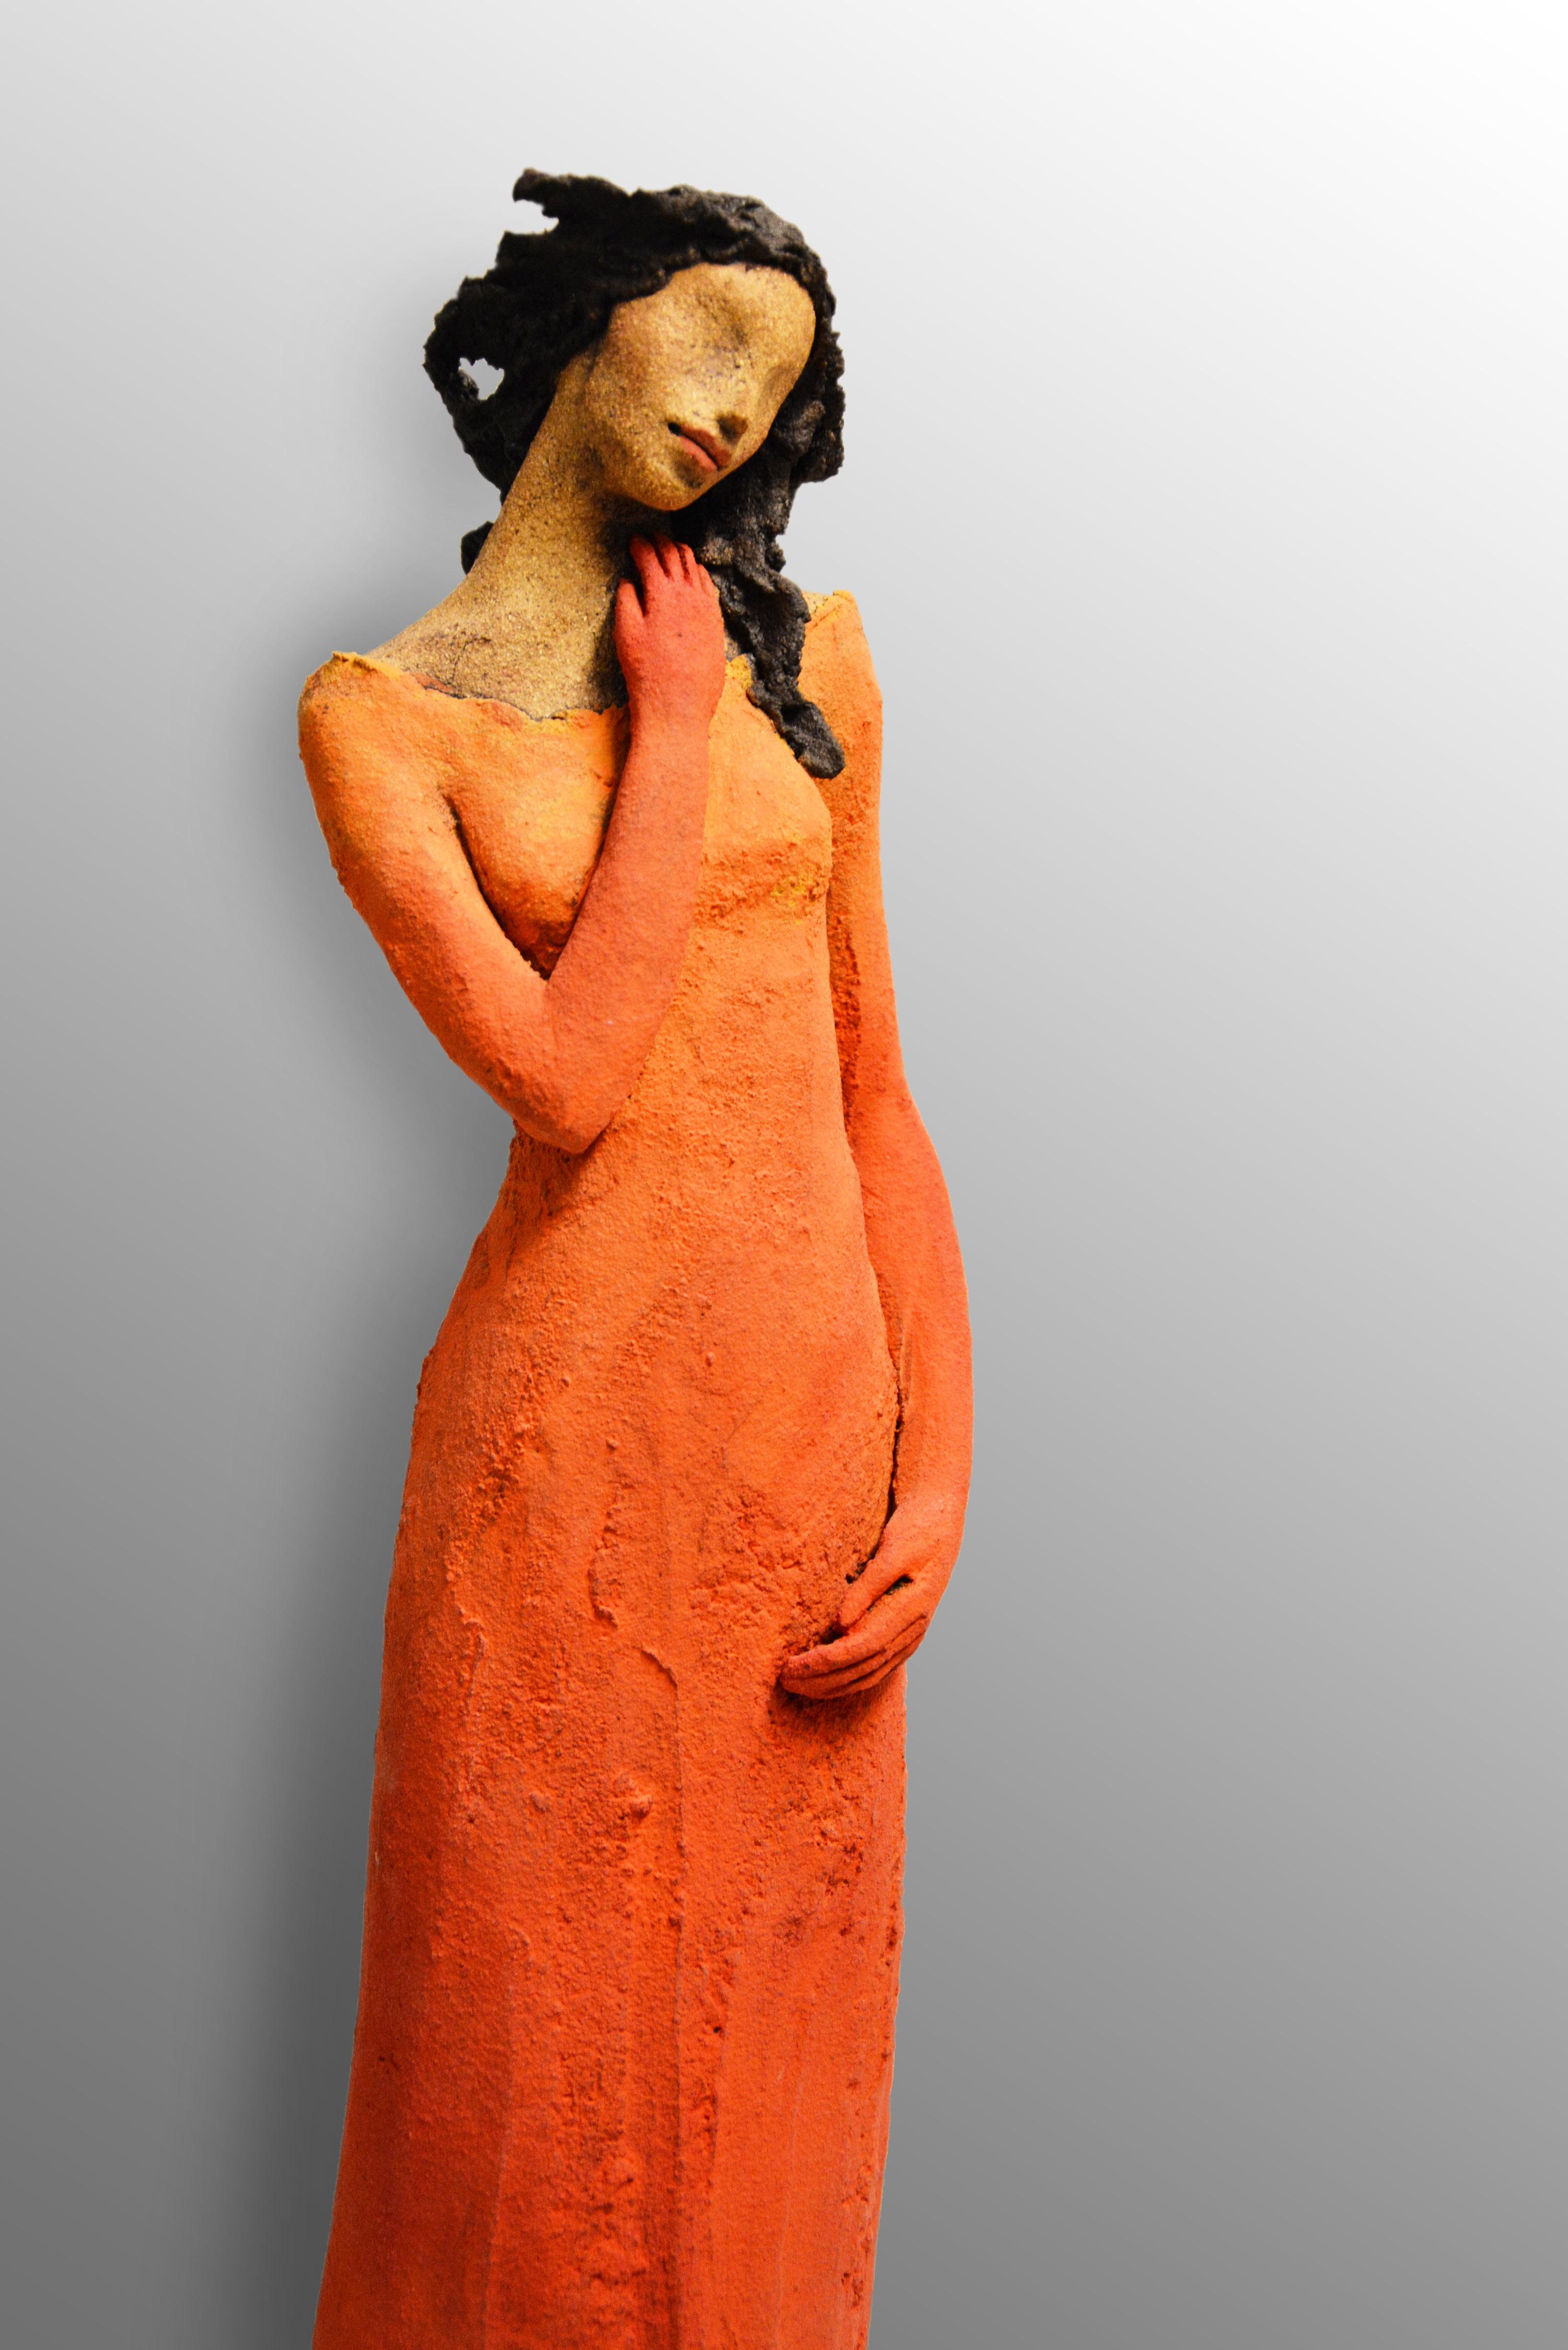 Orange stående dame, keramikk, skulptur, Ingun Dahlin